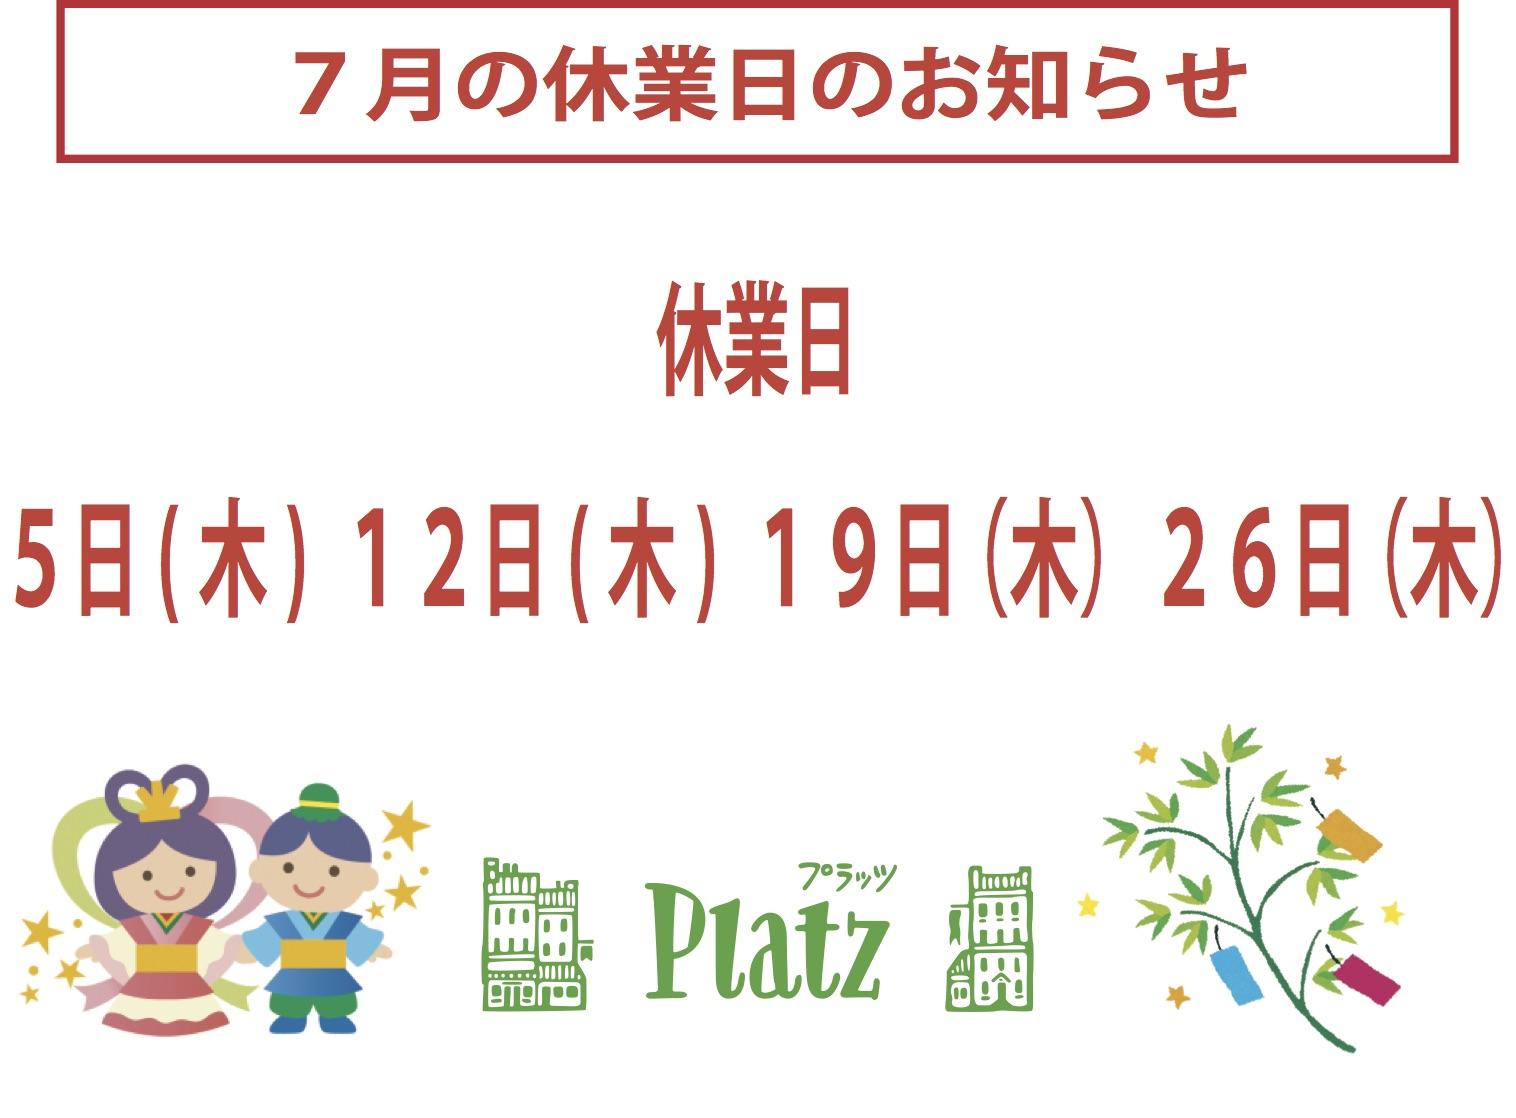 http://www.kyoto-platz.jp/news/images/2018.%EF%BC%97%E6%9C%88%E4%BC%91%E6%A5%AD%E6%97%A5%E3%81%AE%E3%82%B3%E3%83%94%E3%83%BC.jpg